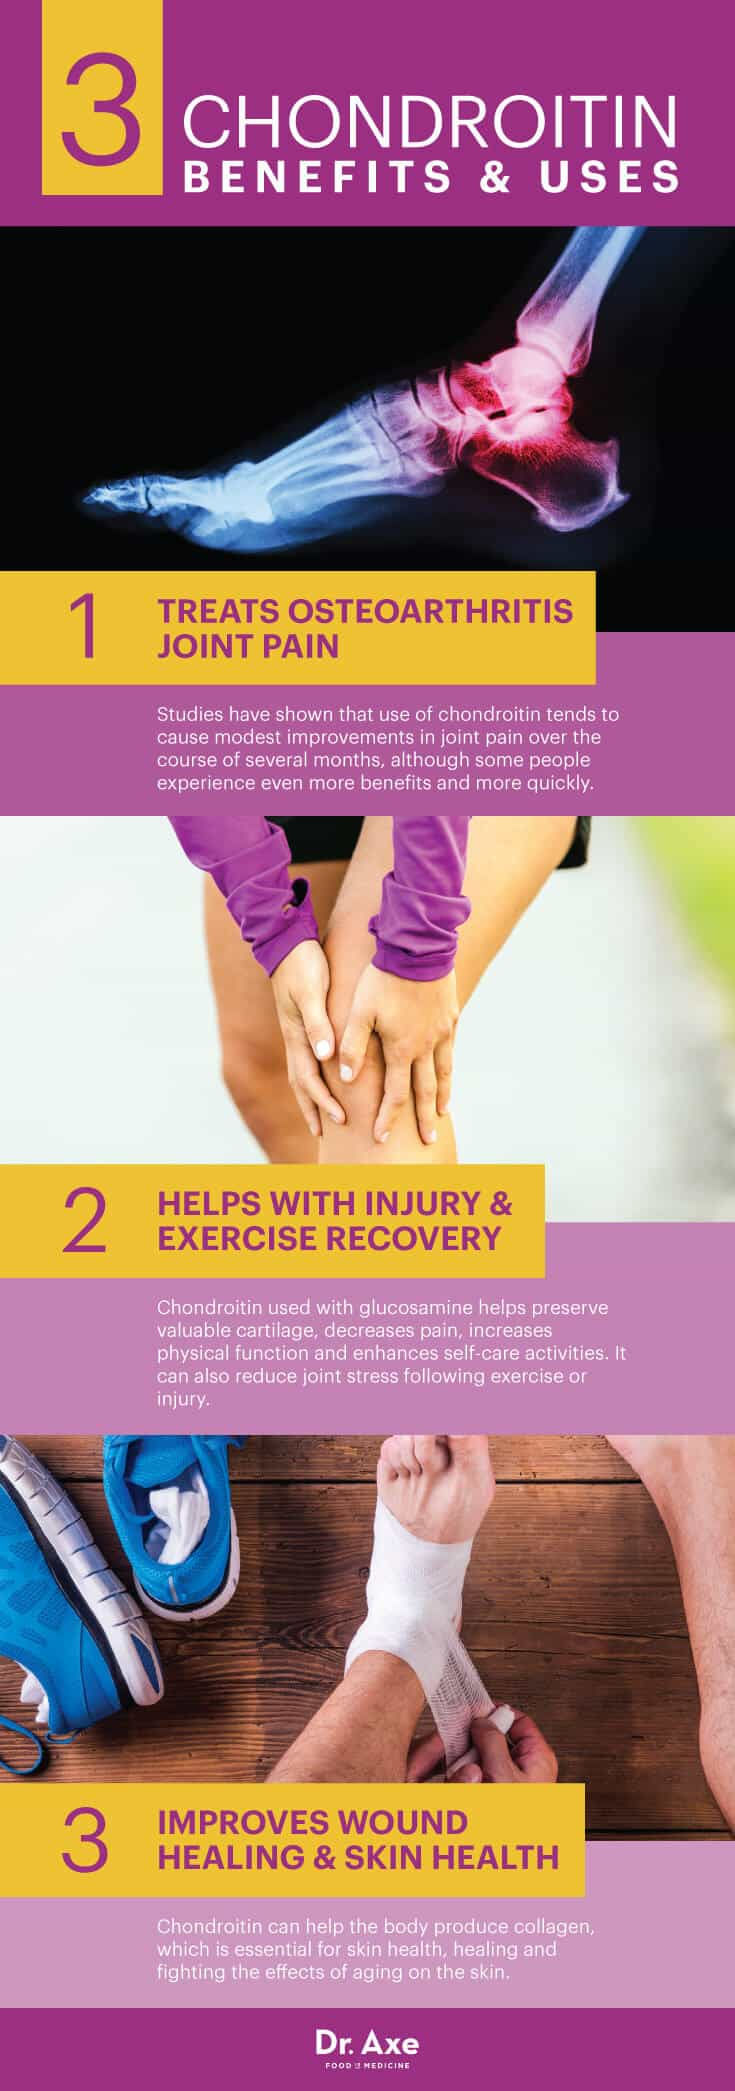 Chondroitin Benefits For Osteoarthritis Amp Joint Pain